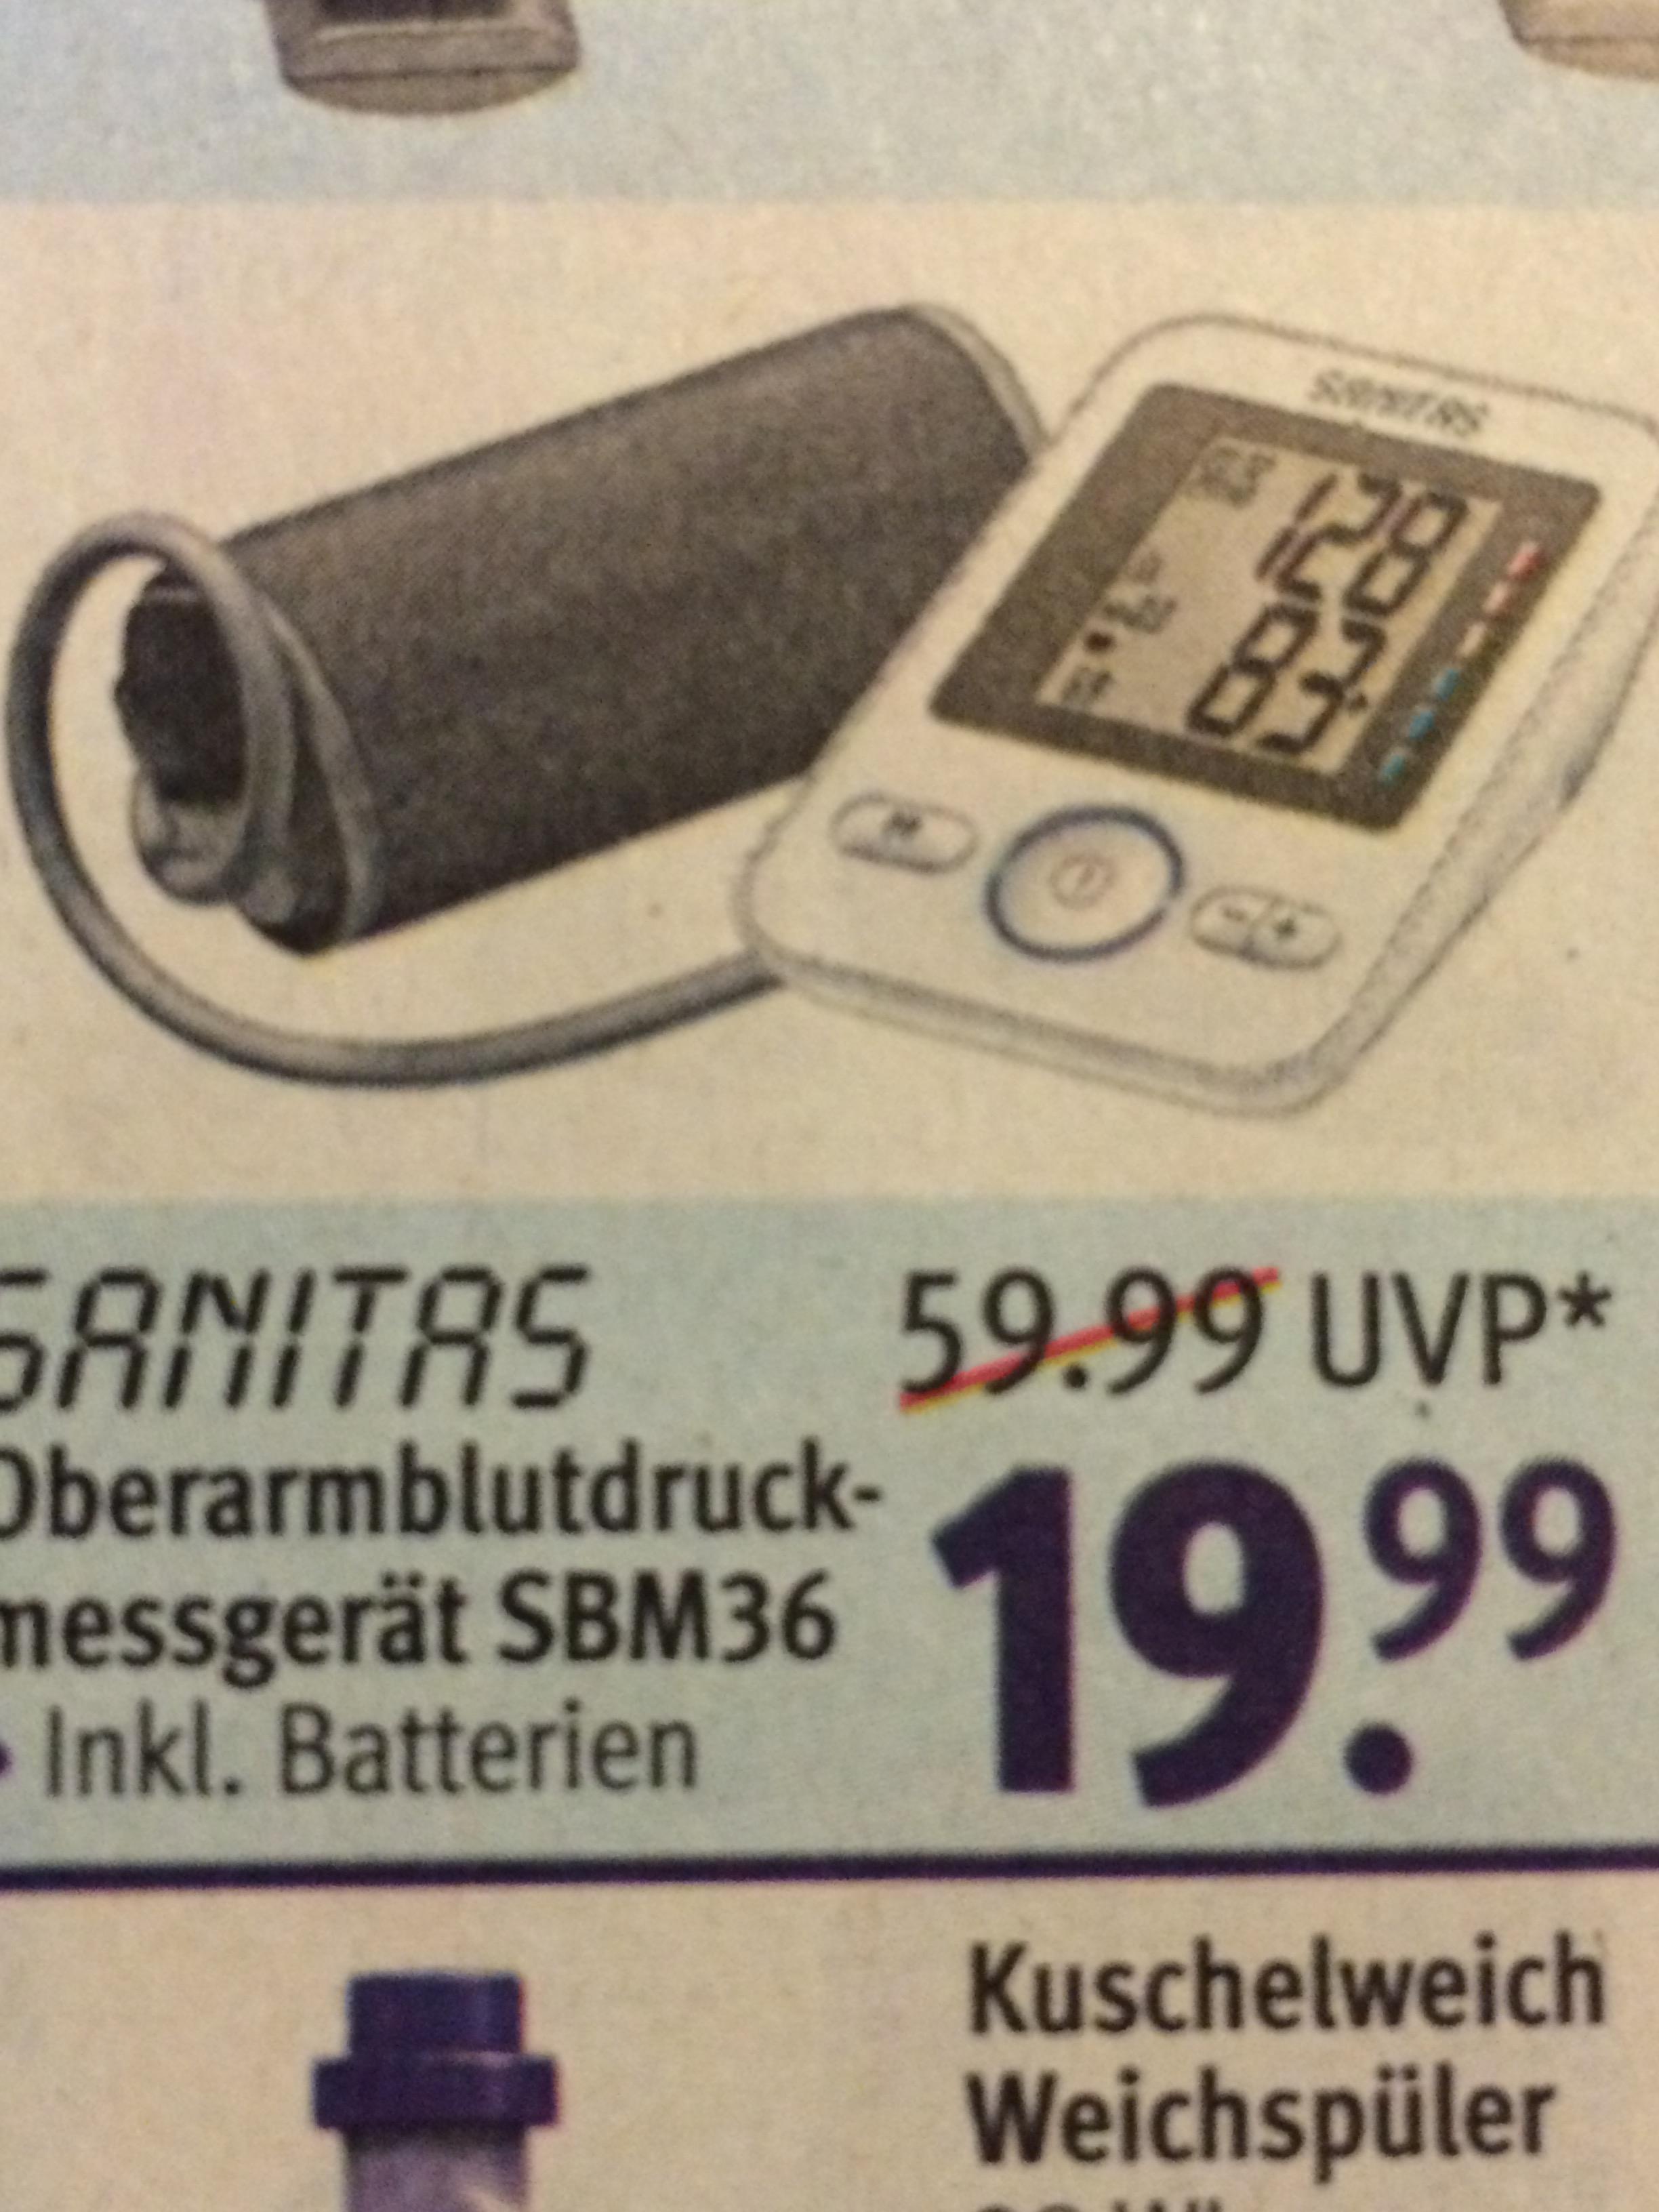 ROSSMANN,ab 01.10  SANITRS Blutdruckgerät SBM36  nur für 19.99EURO